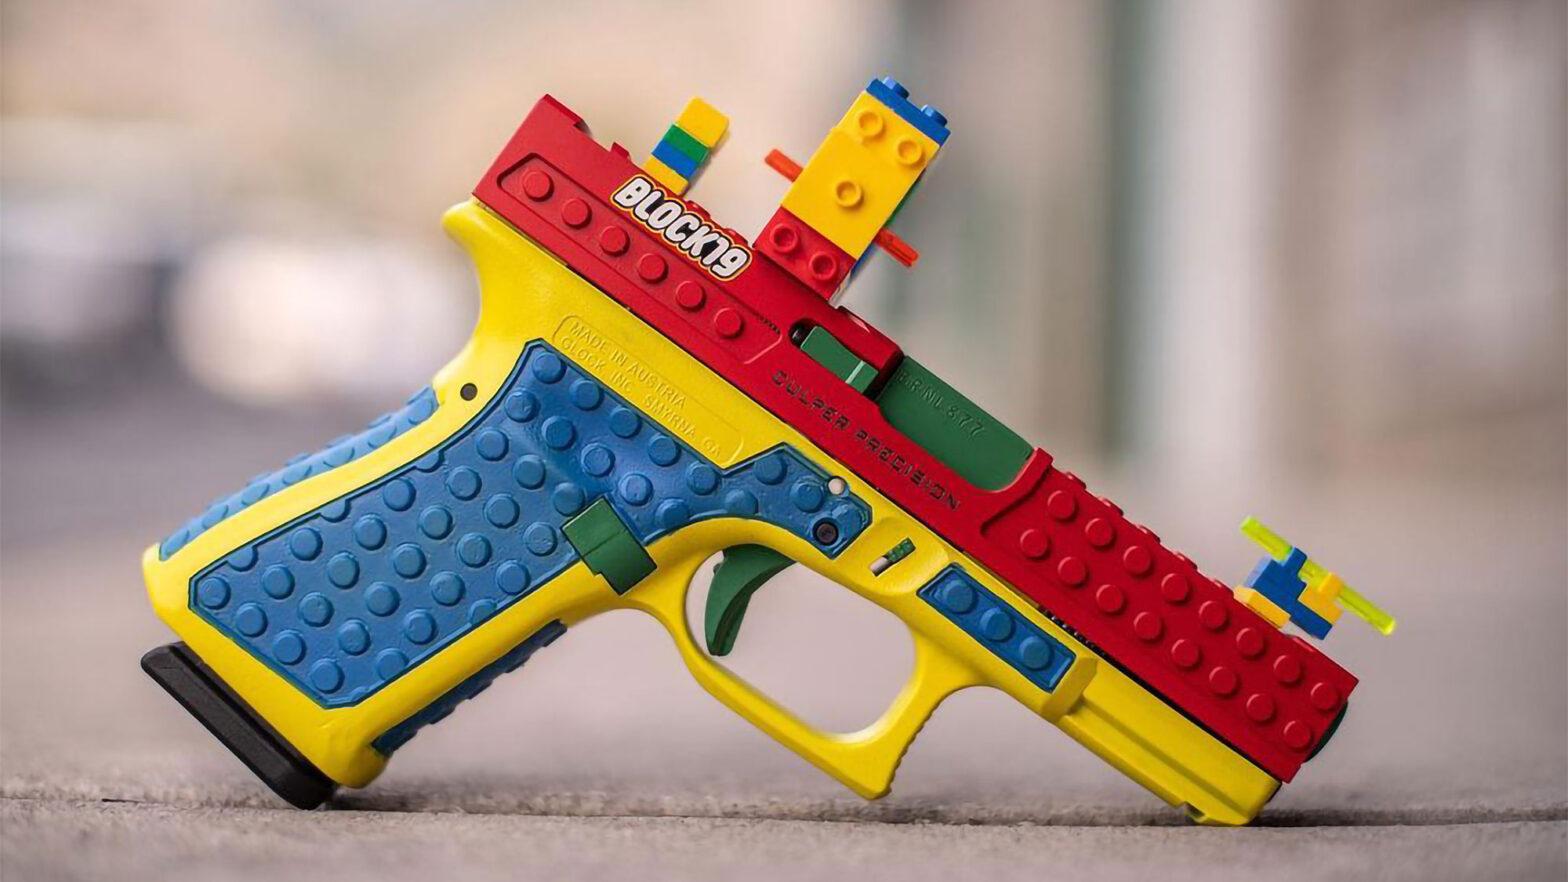 LEGO-style Block 19 Semi-automatic Pistol